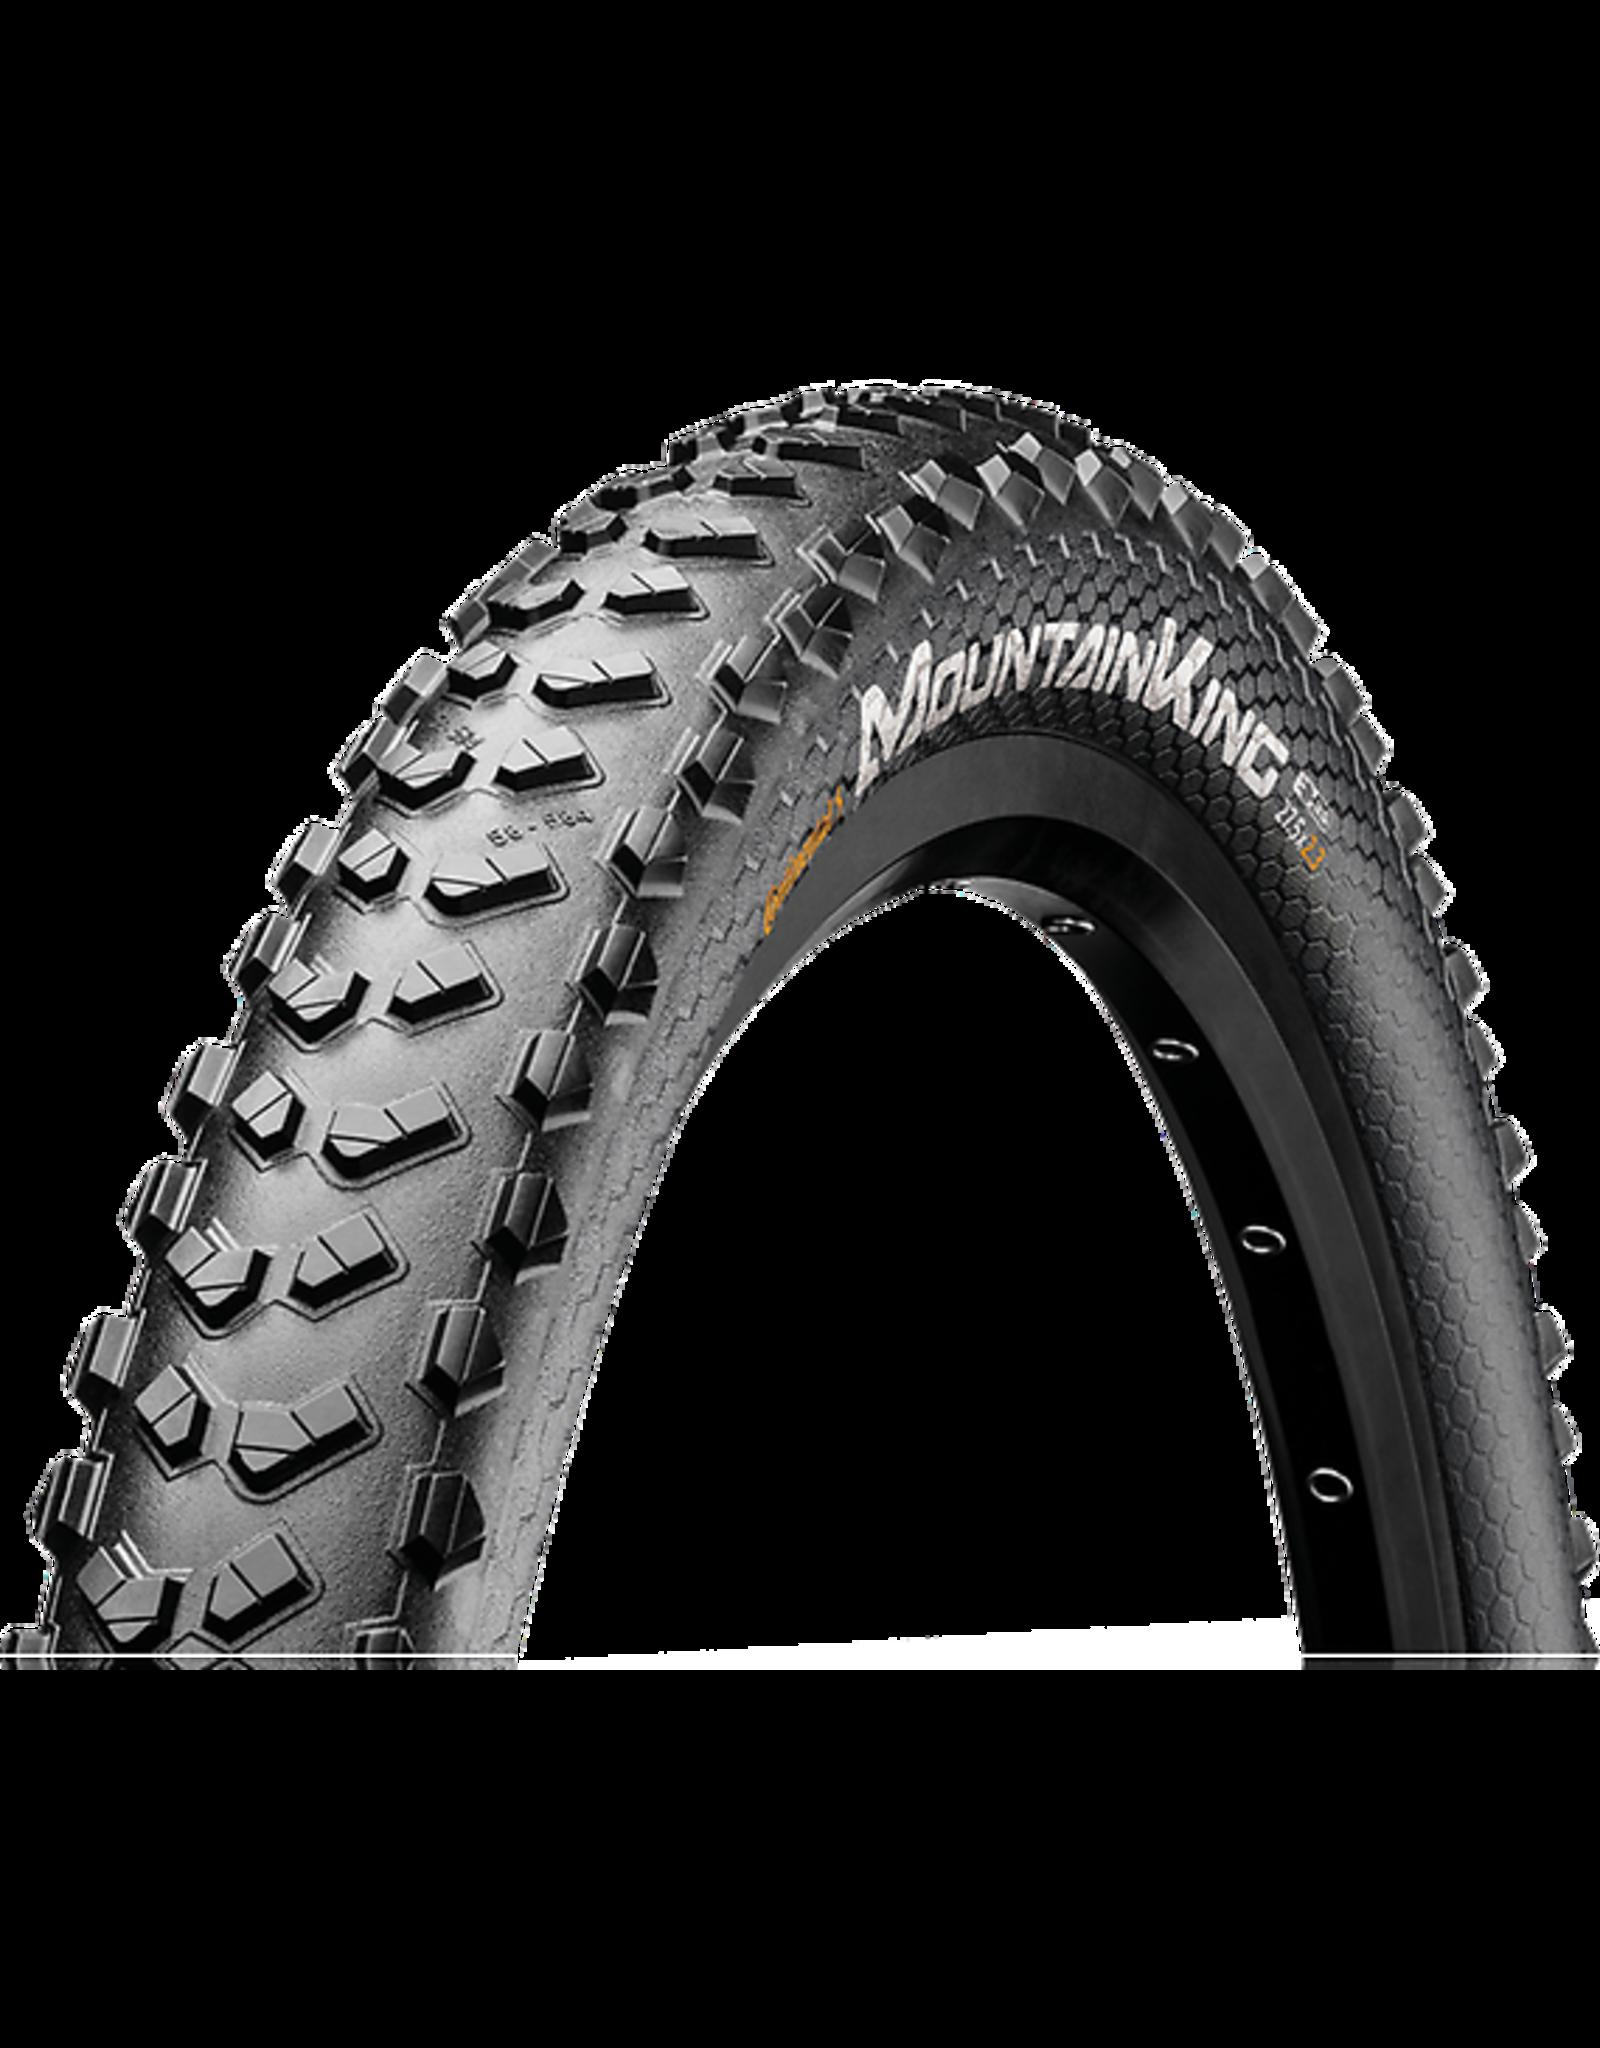 29x2.3 Mountain King Wire Bead Tire